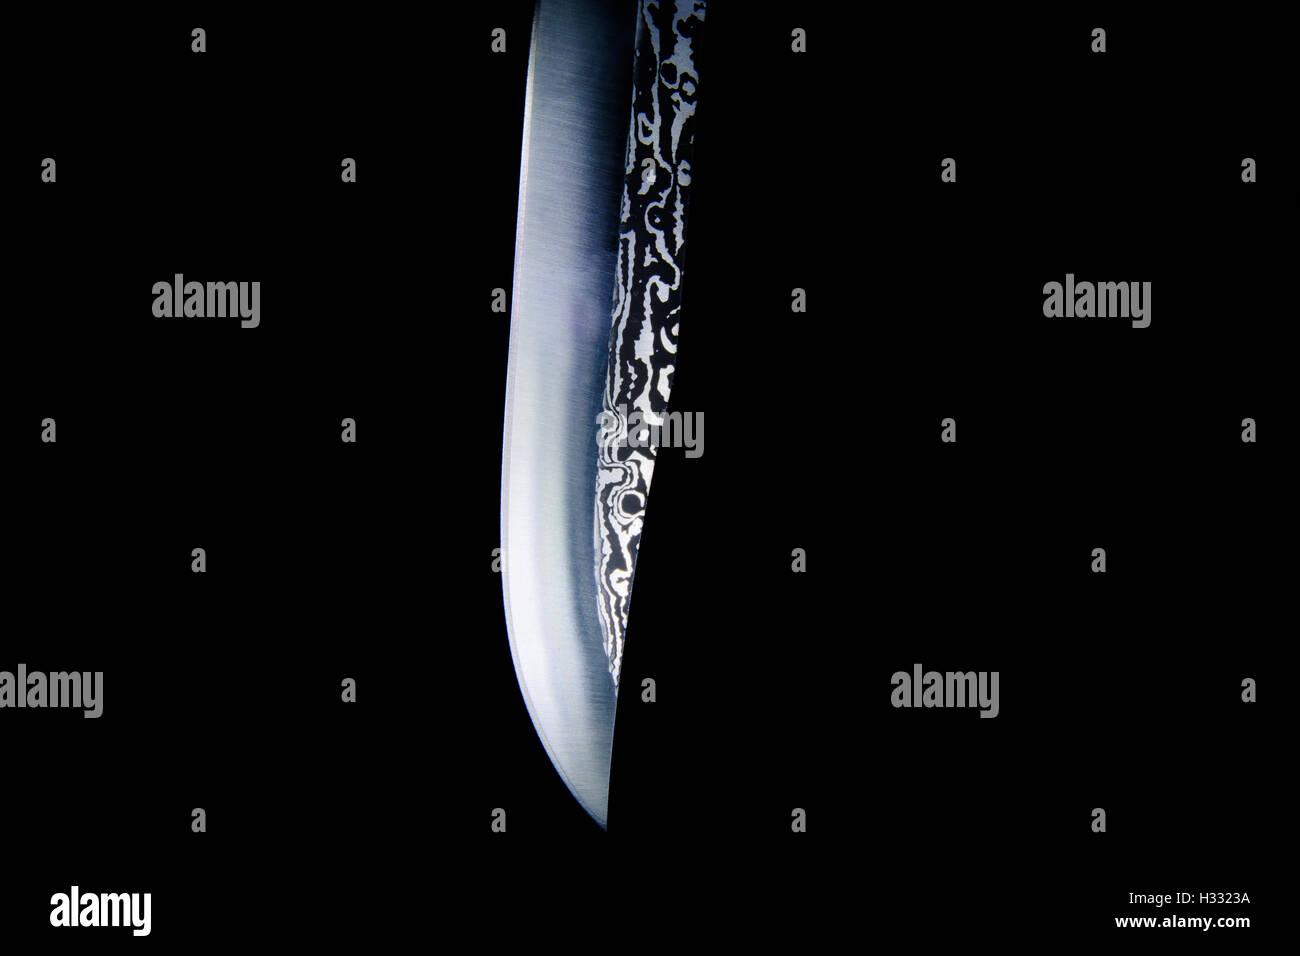 Knife blade - Stock Image